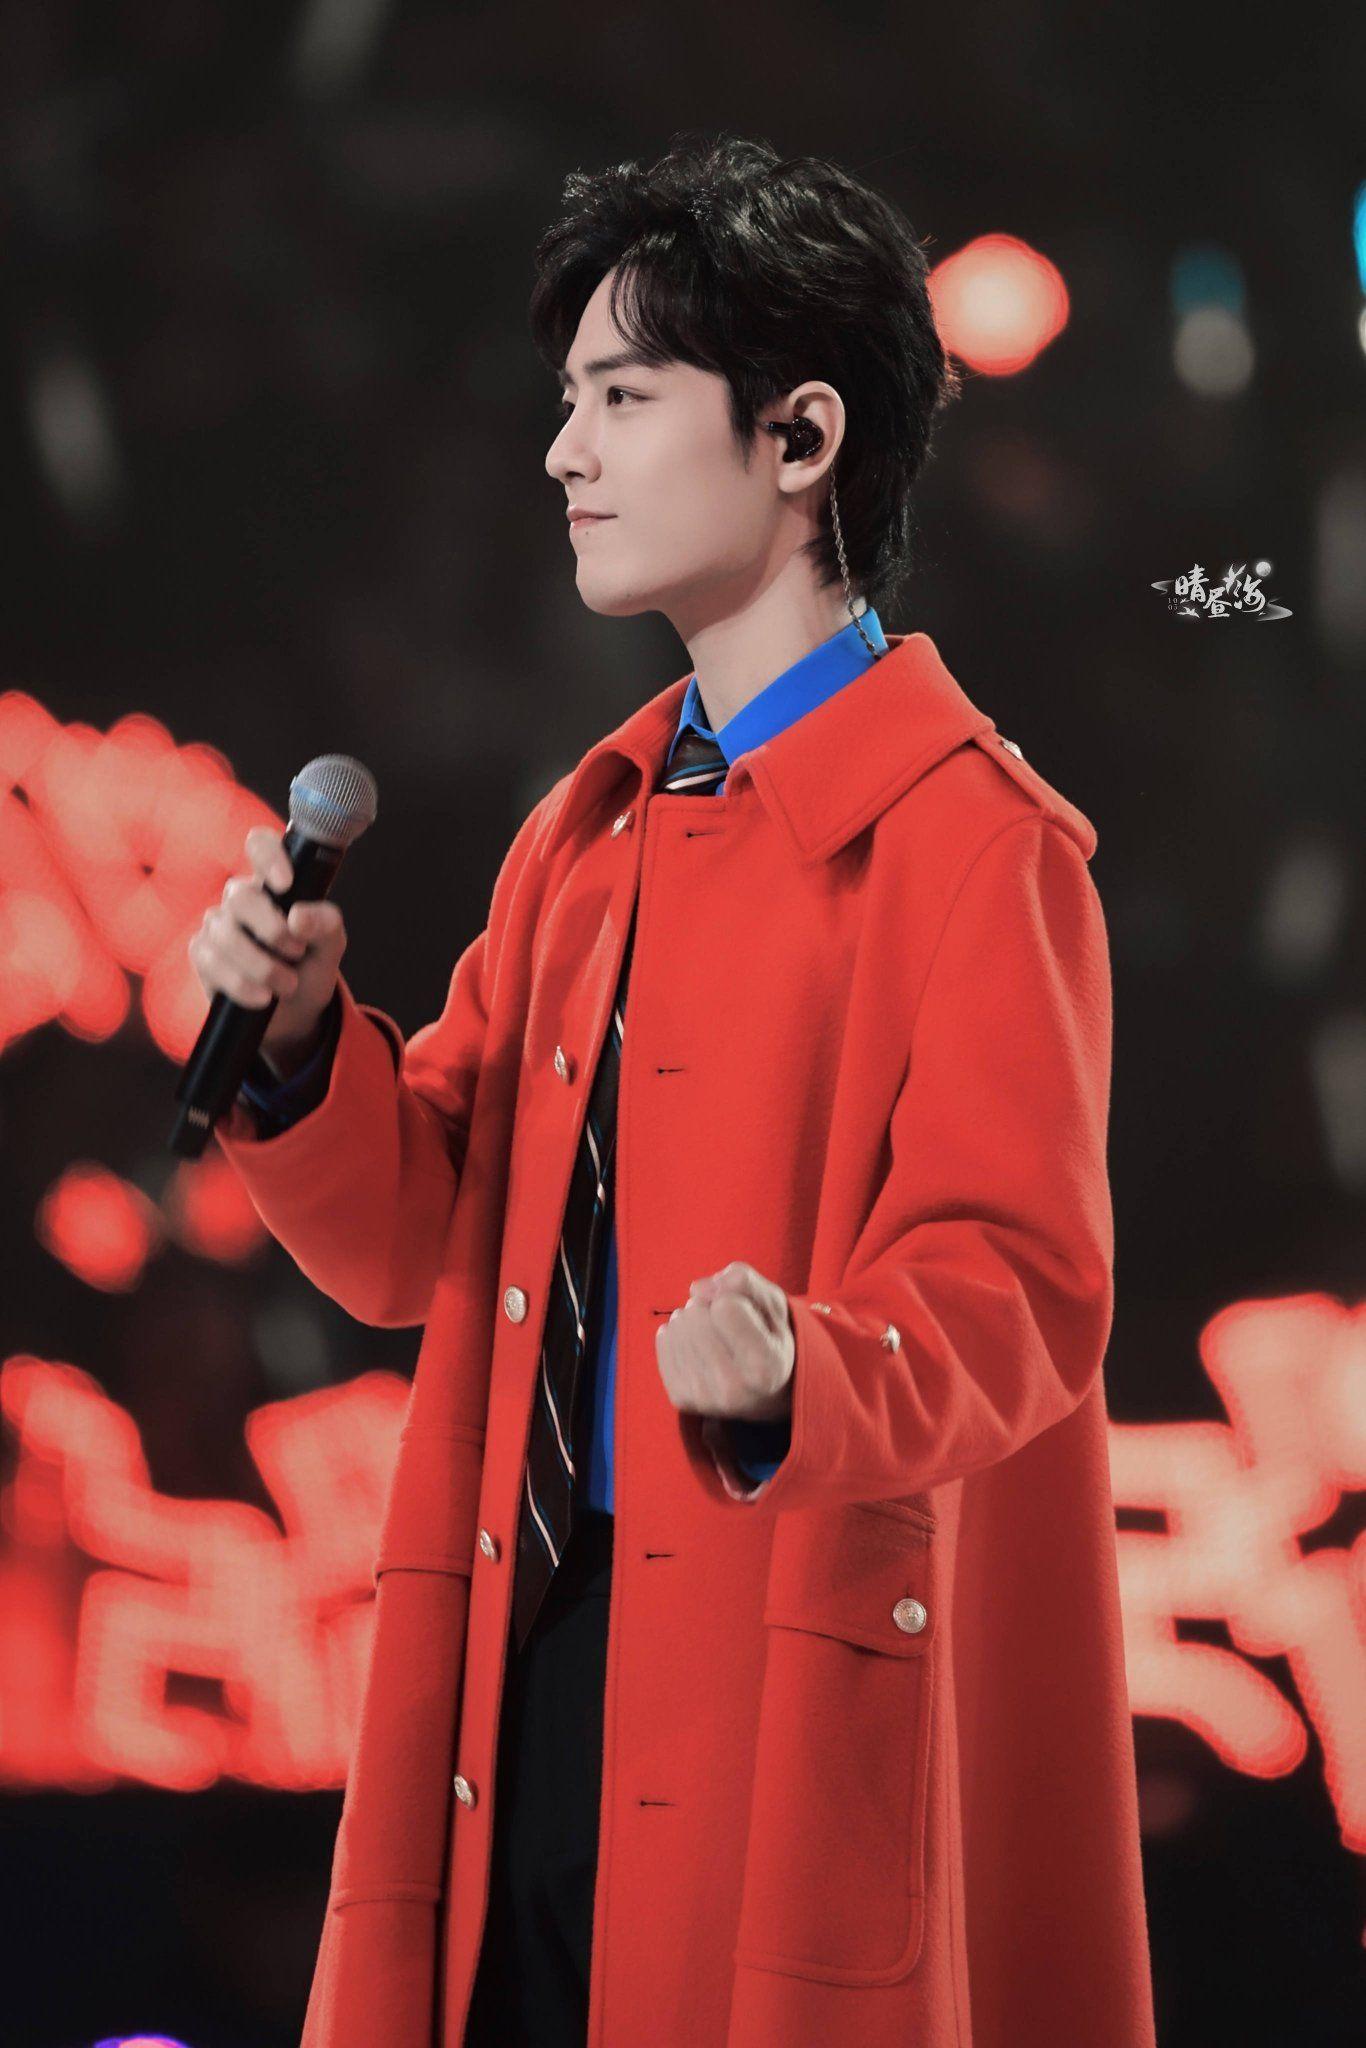 191231 XiaoZhan Dragon TV's New Year Countdown Concert